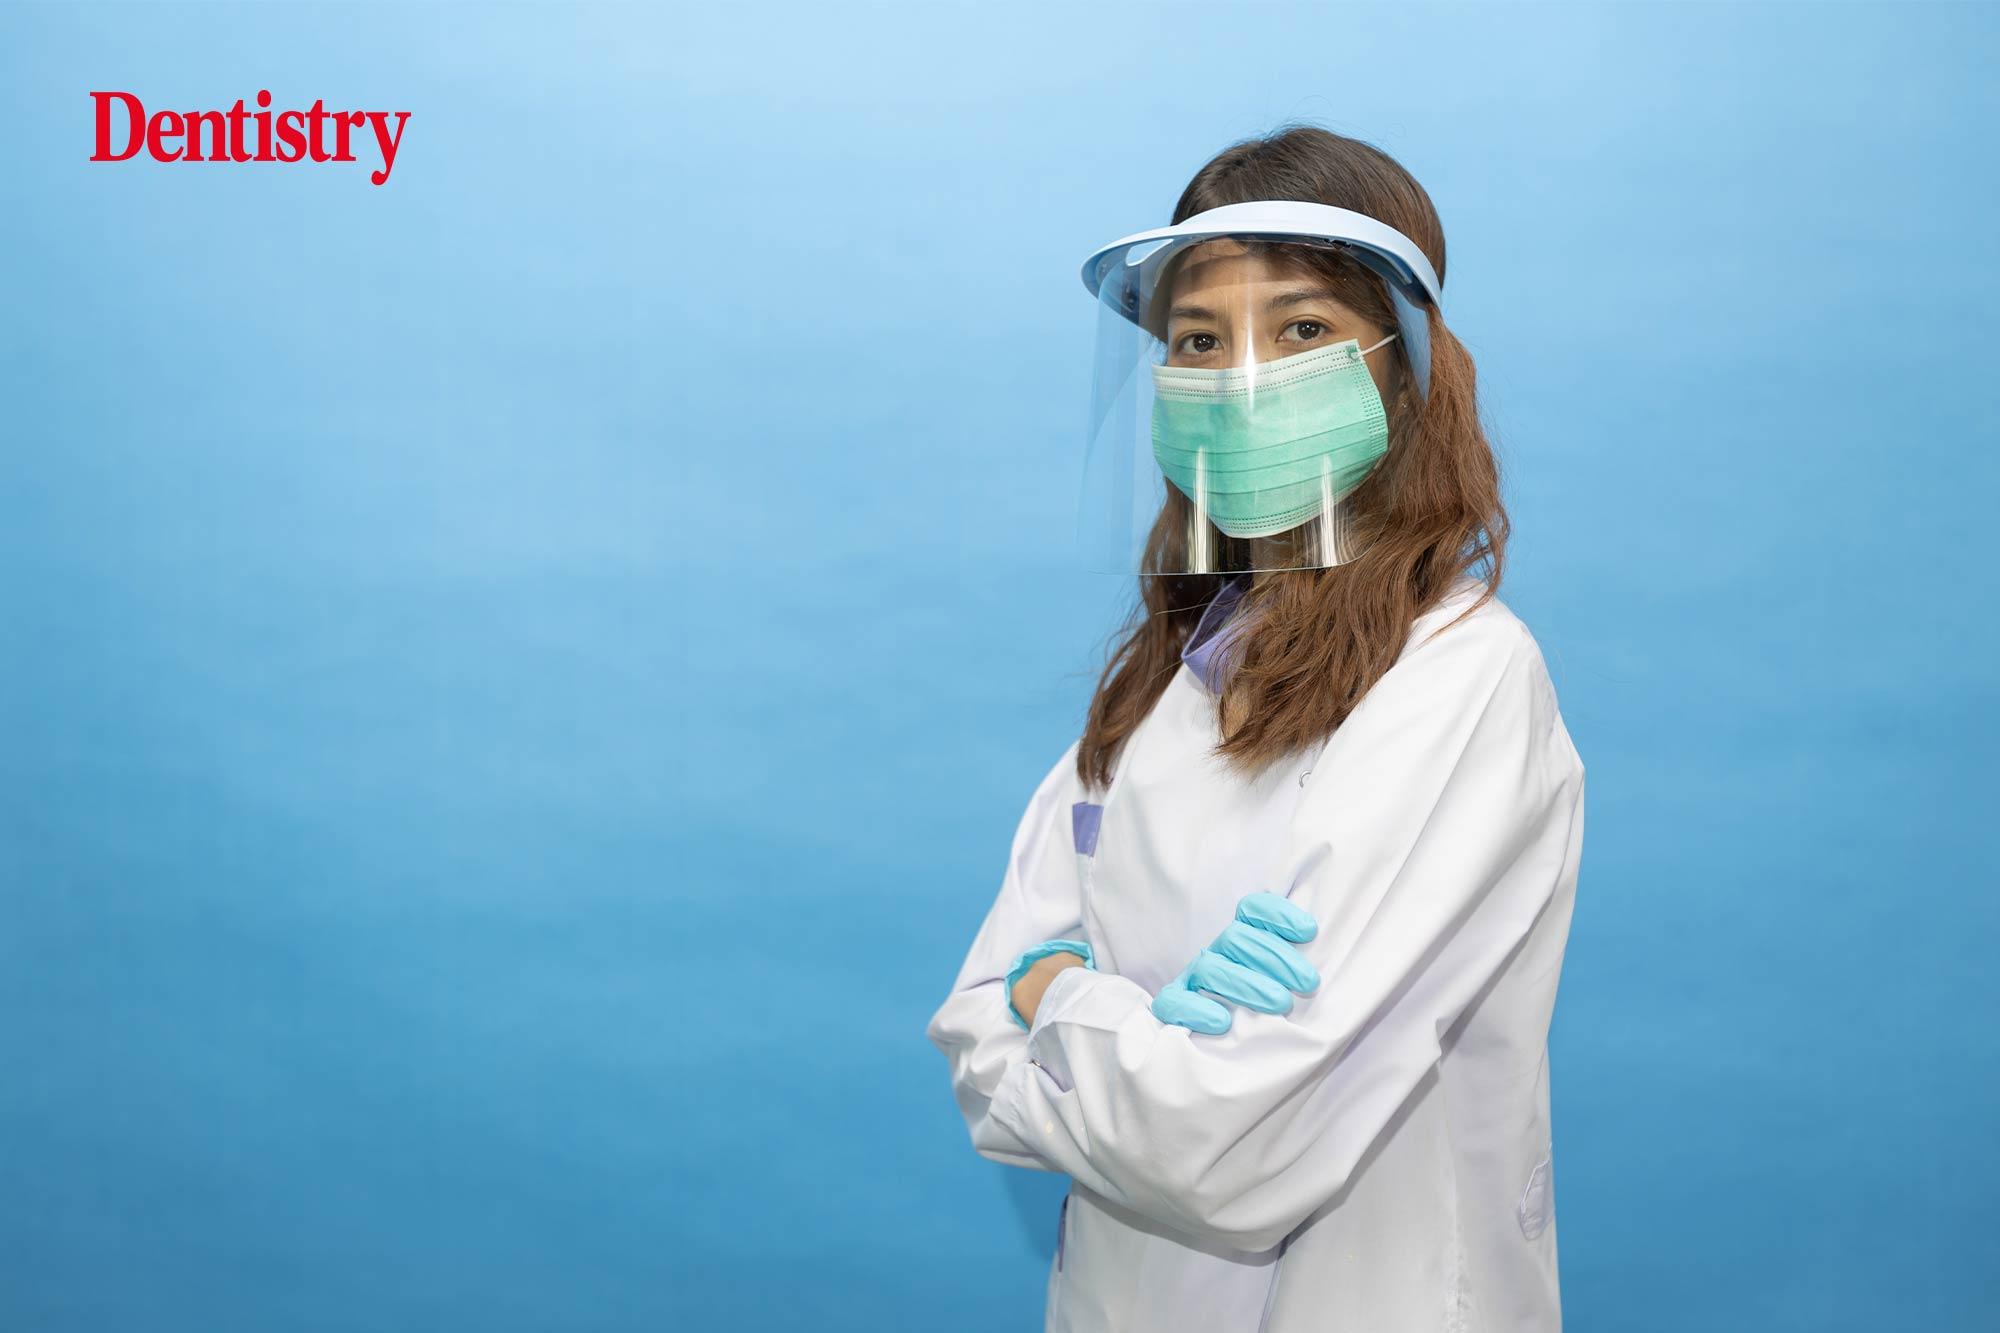 foundation dentist